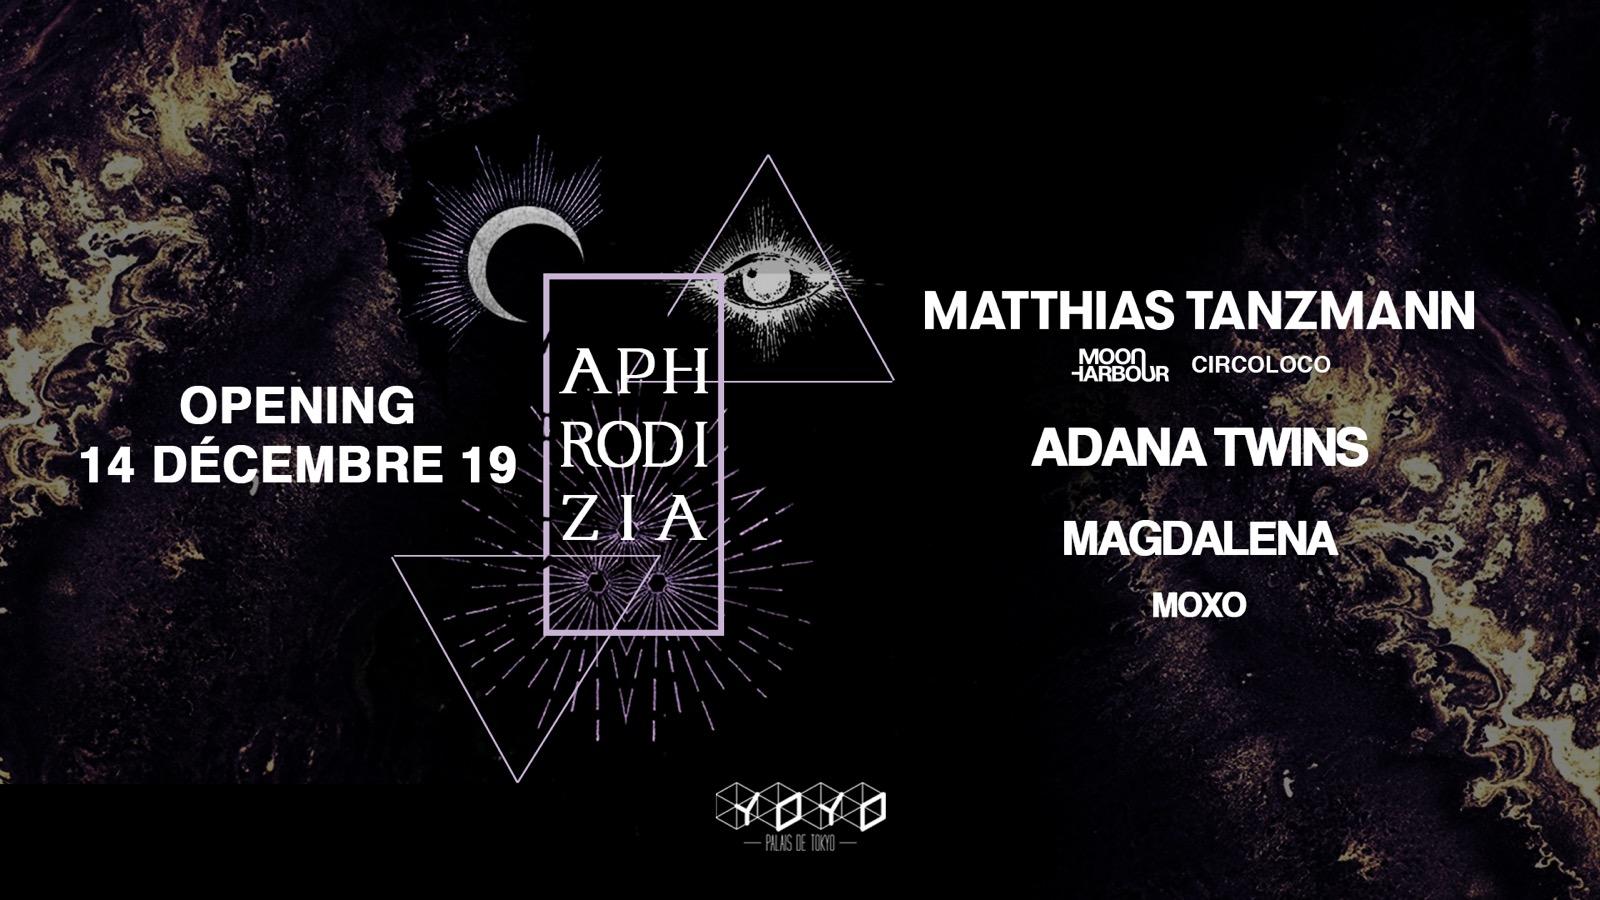 Aphrodizia @YOYO w/ Matthias Tanzmann, Adana Twins, Magdalena, Moxo